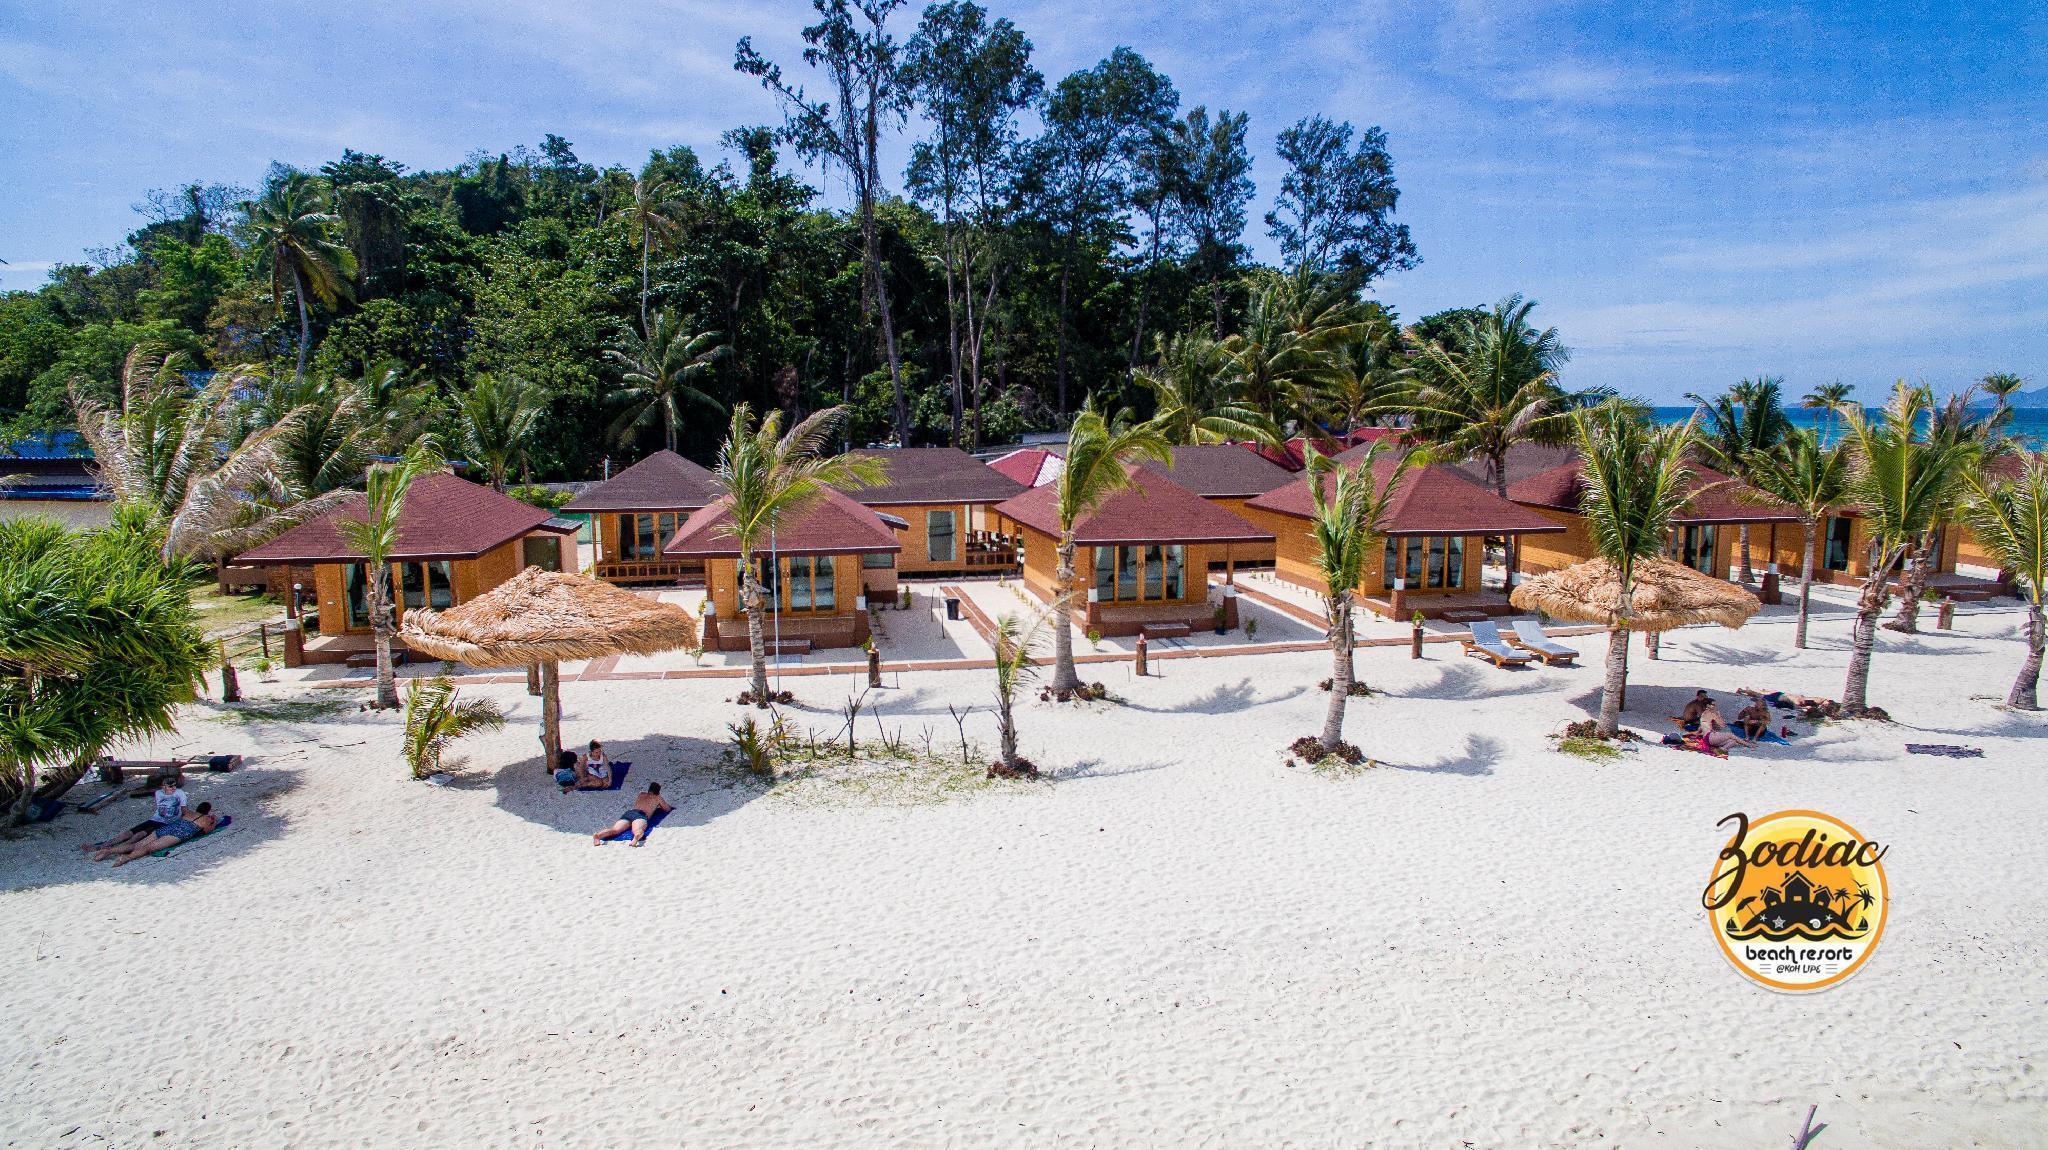 Zodiac See Sun Resort โซดิแอค ซีซัน รีสอร์ต